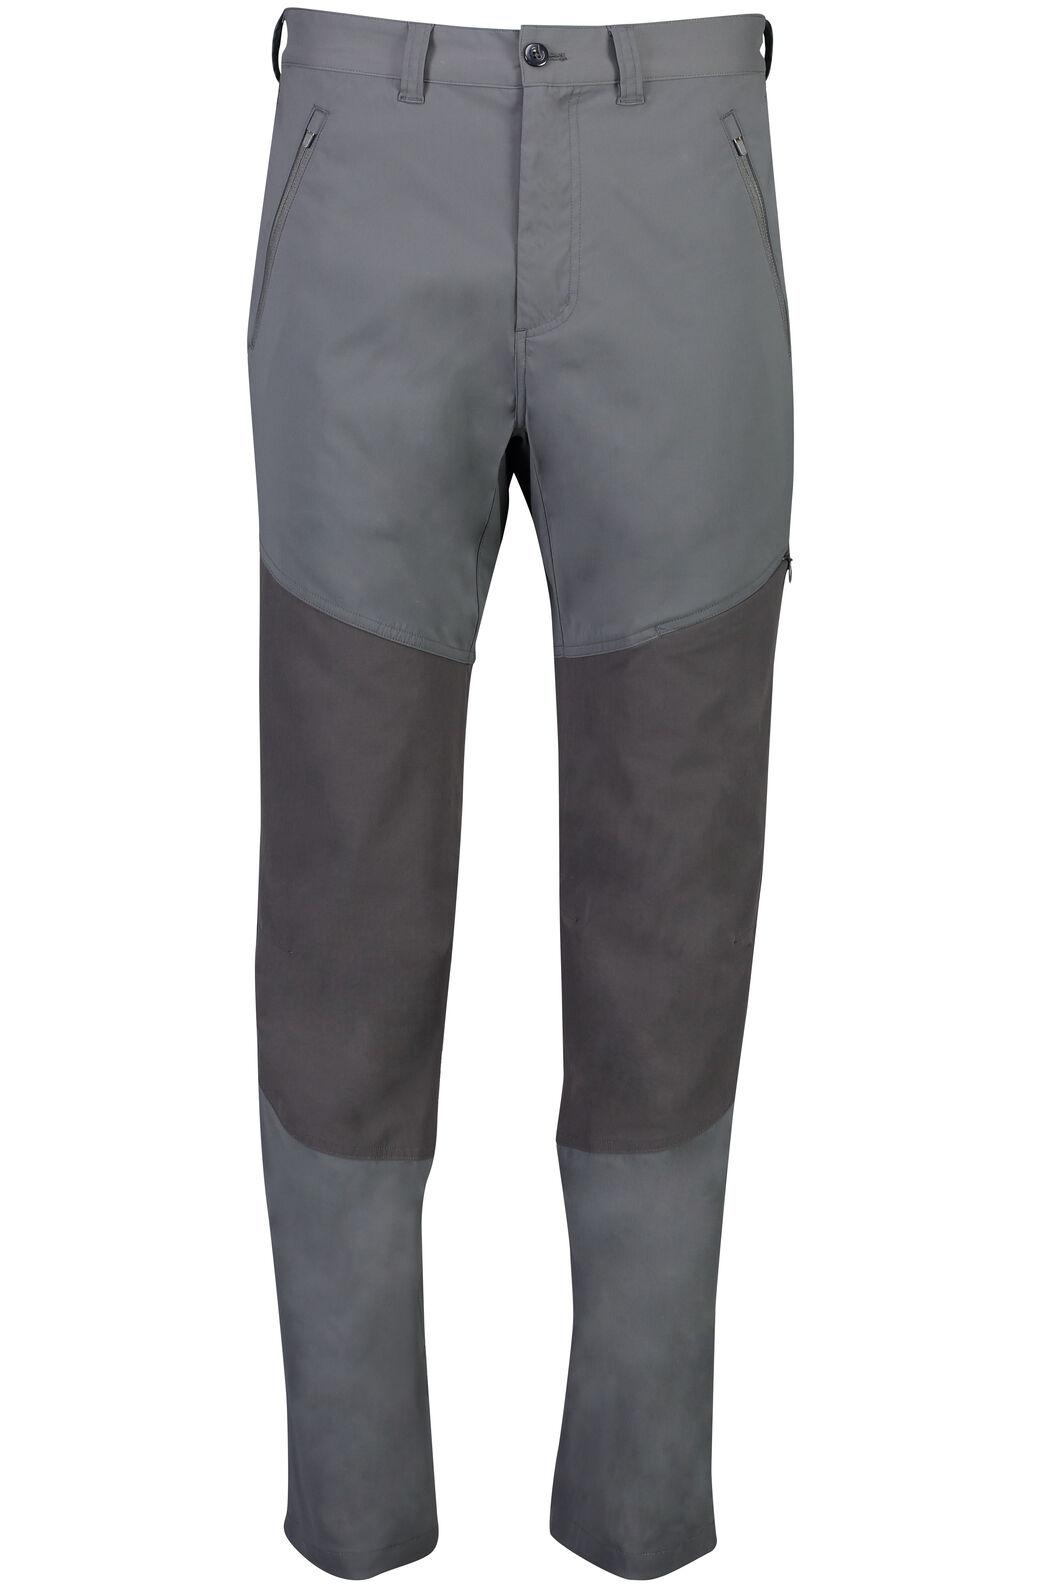 Macpac Endurance Pants - Men's, Asphalt, hi-res